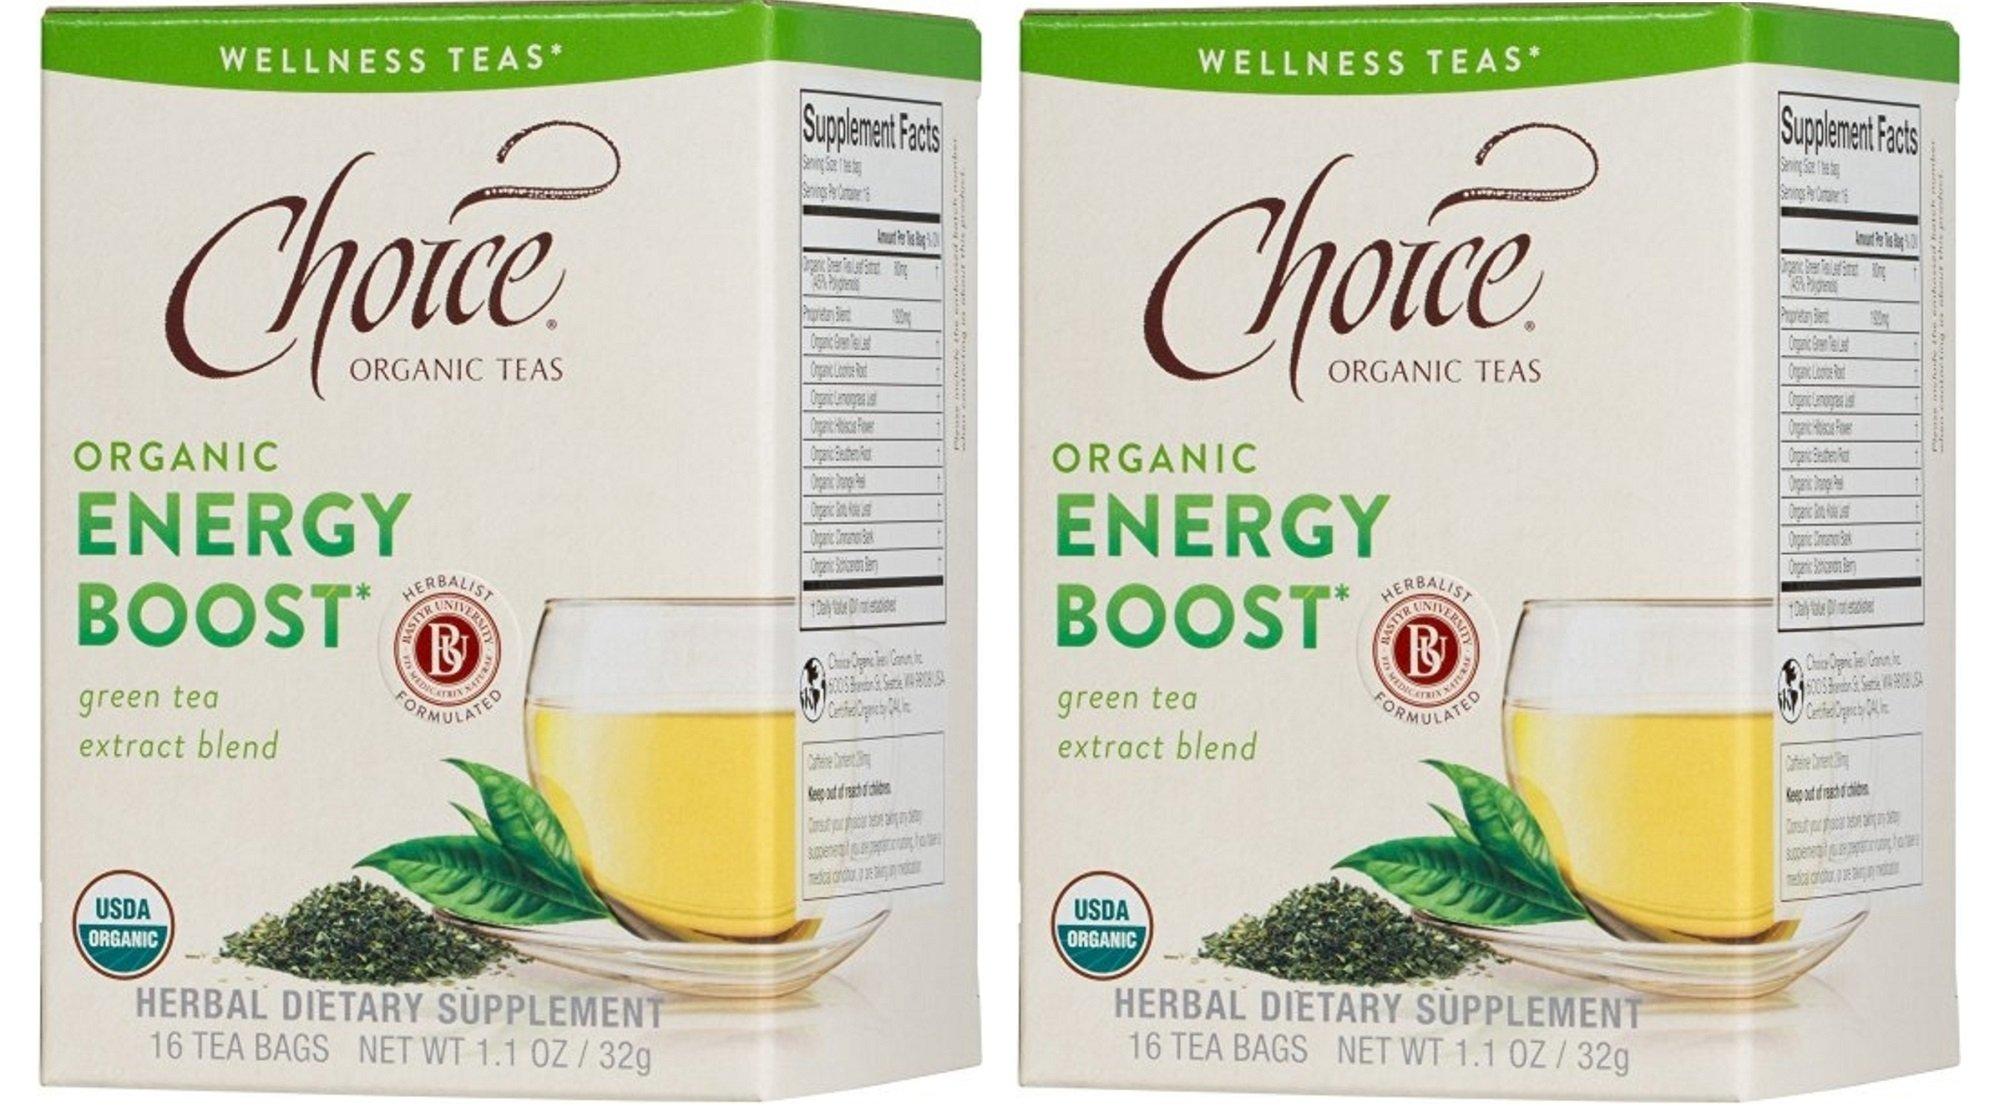 Choice Organic Teas Energy Boost Green Tea Extract Blend -- 16 Tea Bags - 2 pc